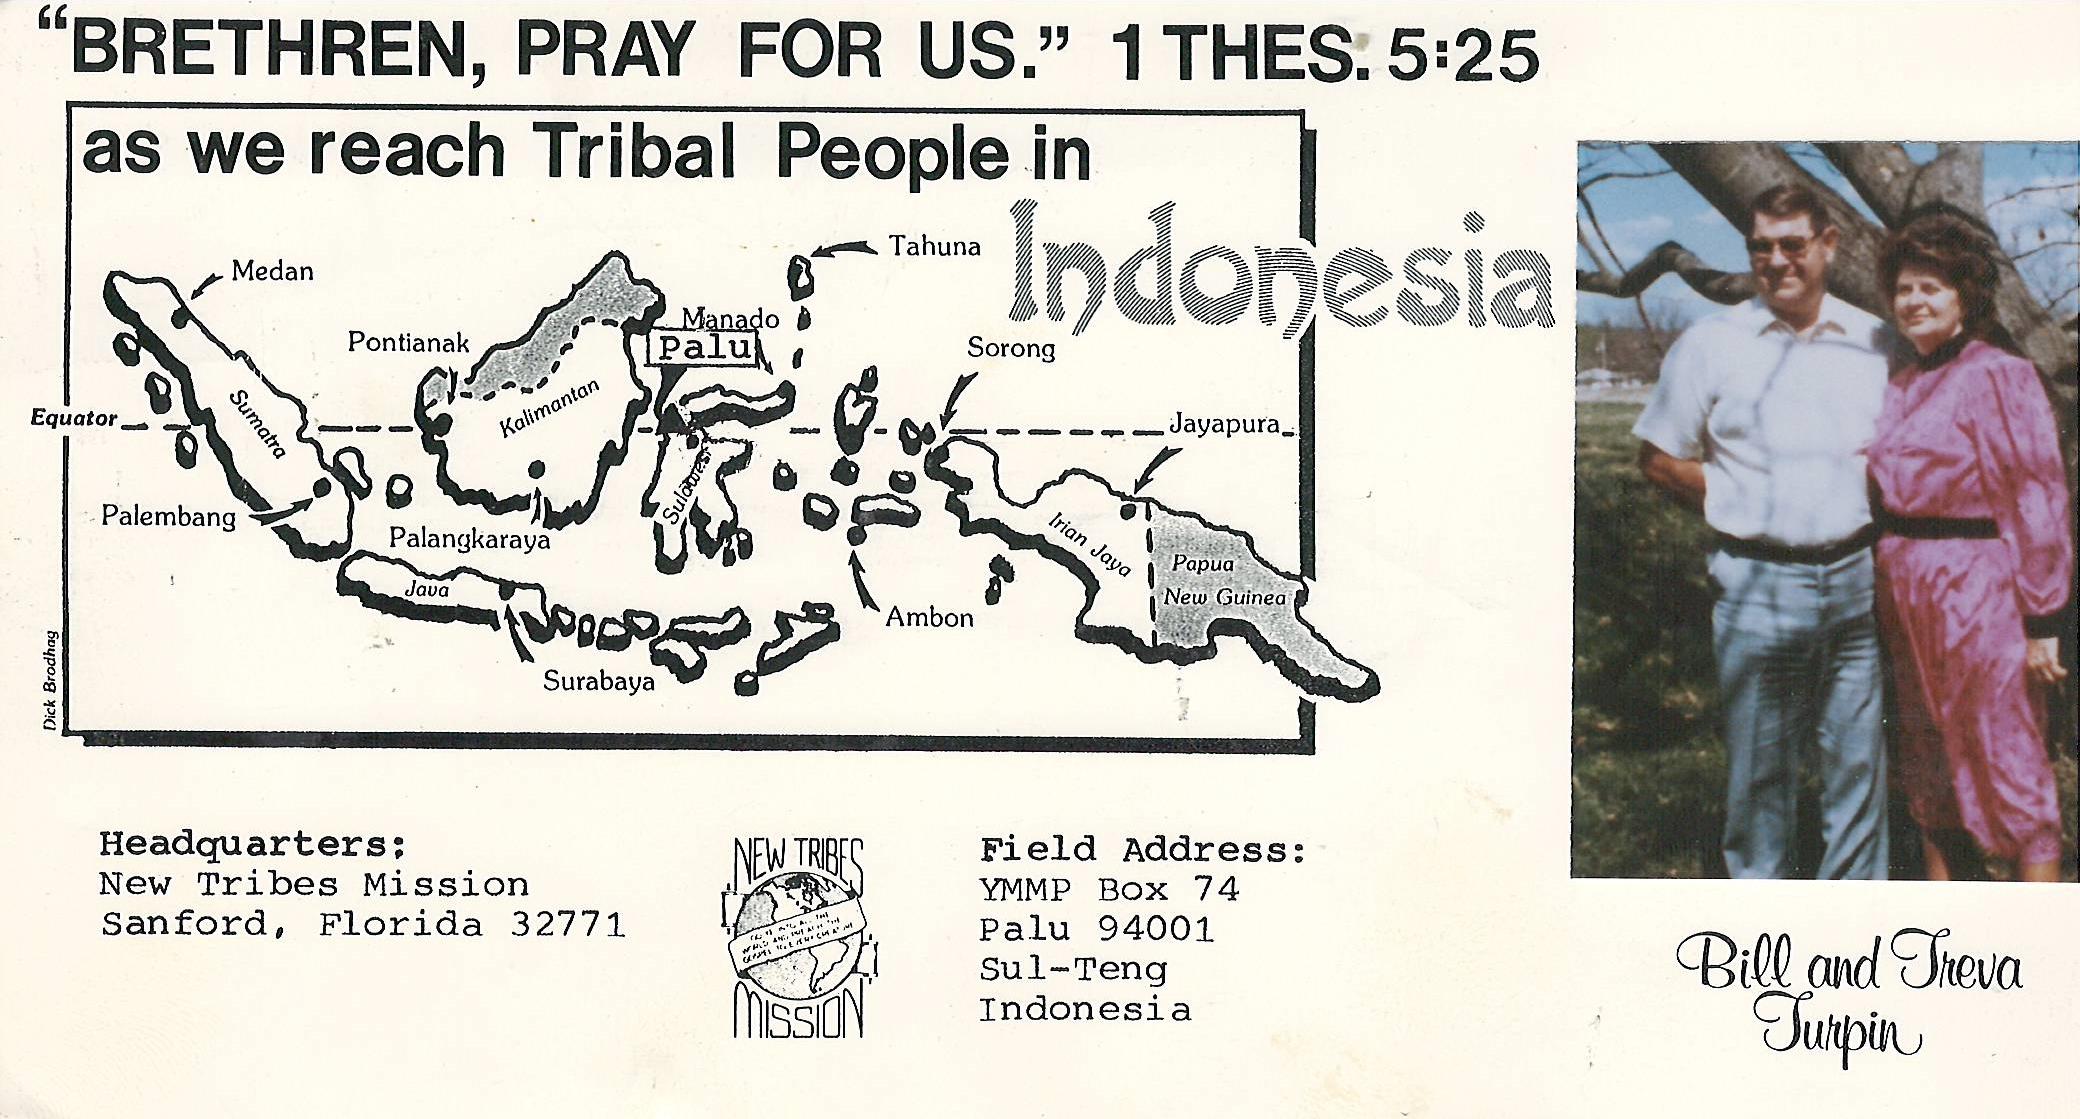 Bill and Treva Indonesia.JPG